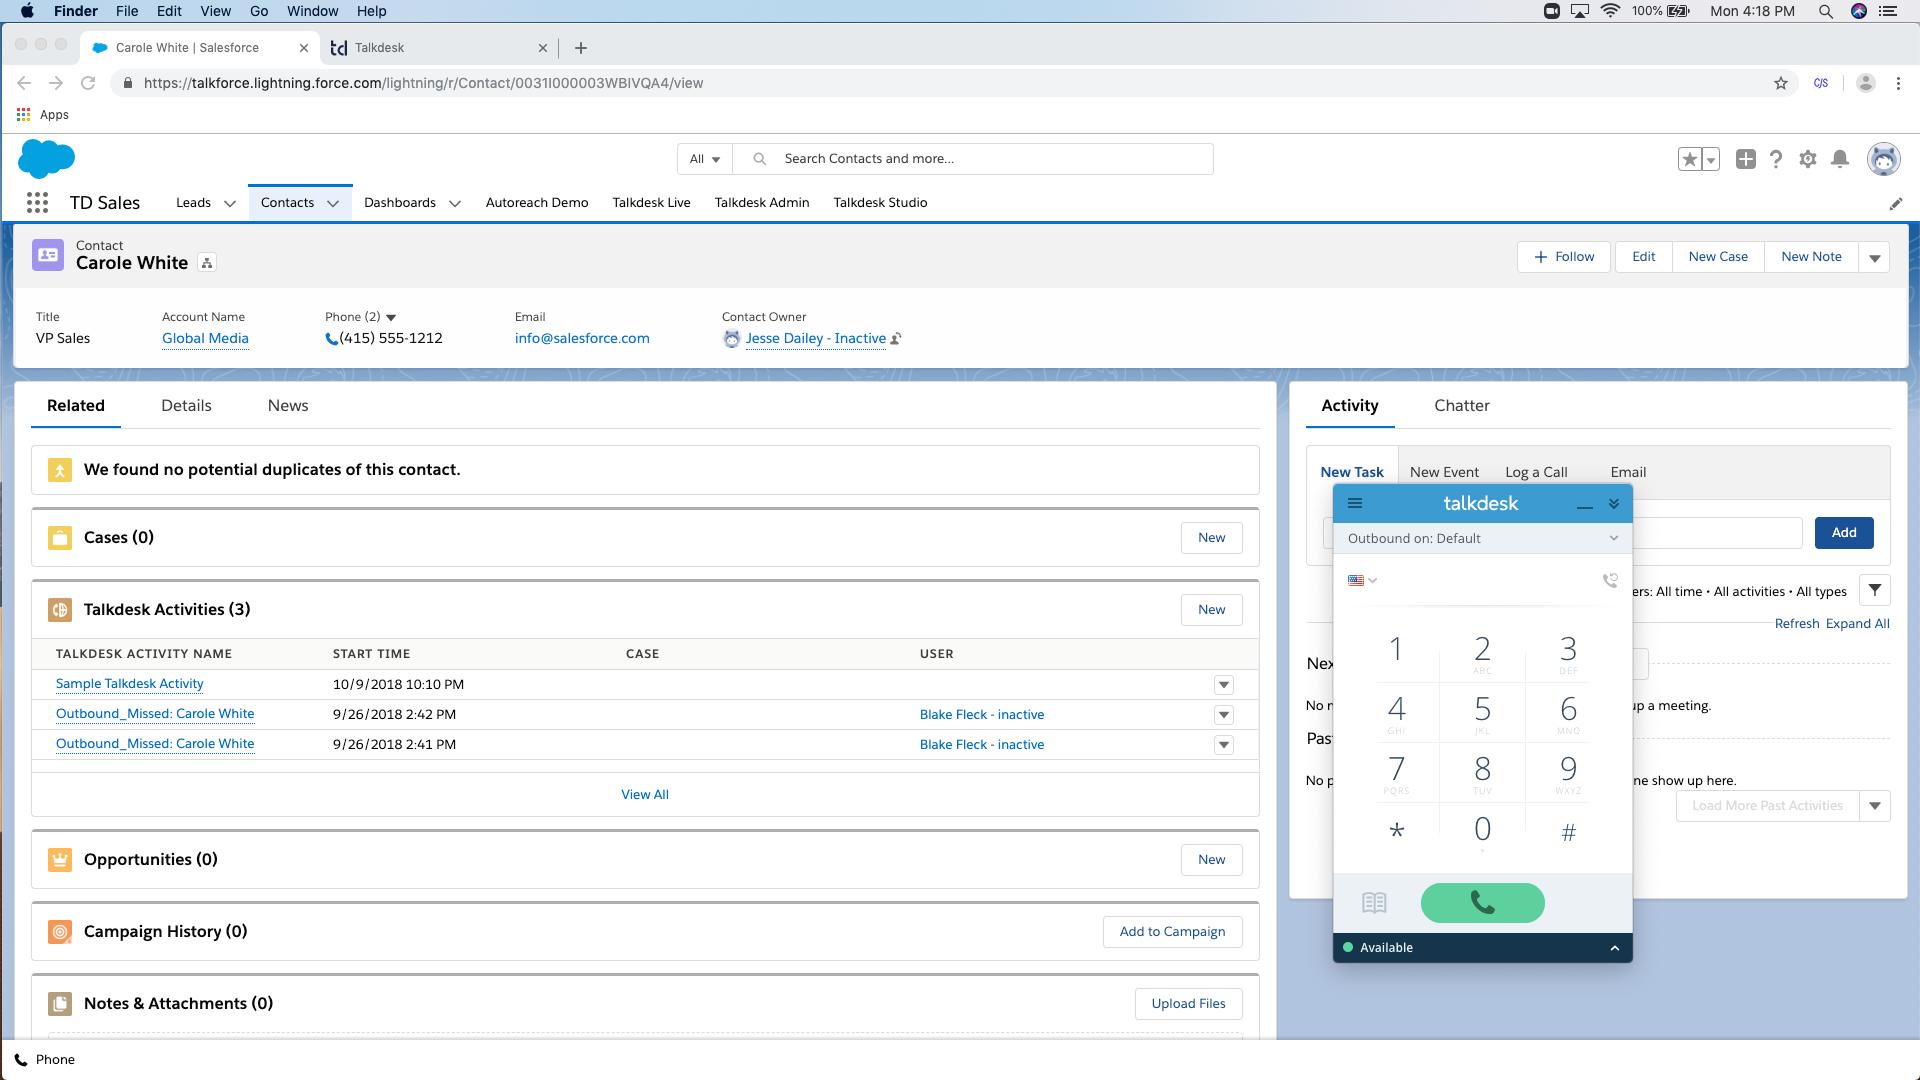 Talkdesk Software - Talkdesk for Salesforce